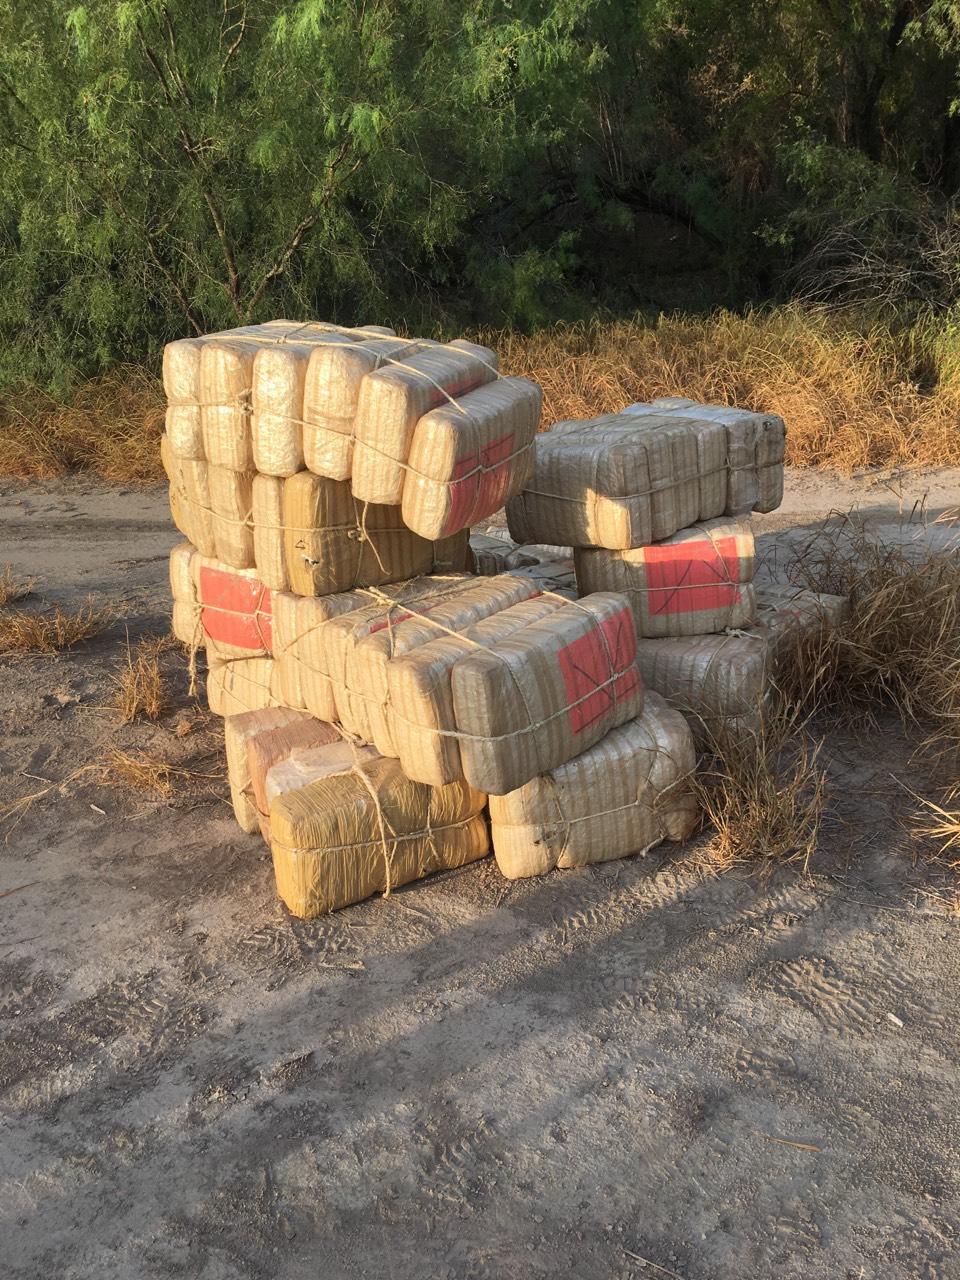 border patrol half a ton marijuana_1536291725003.jpg.jpg